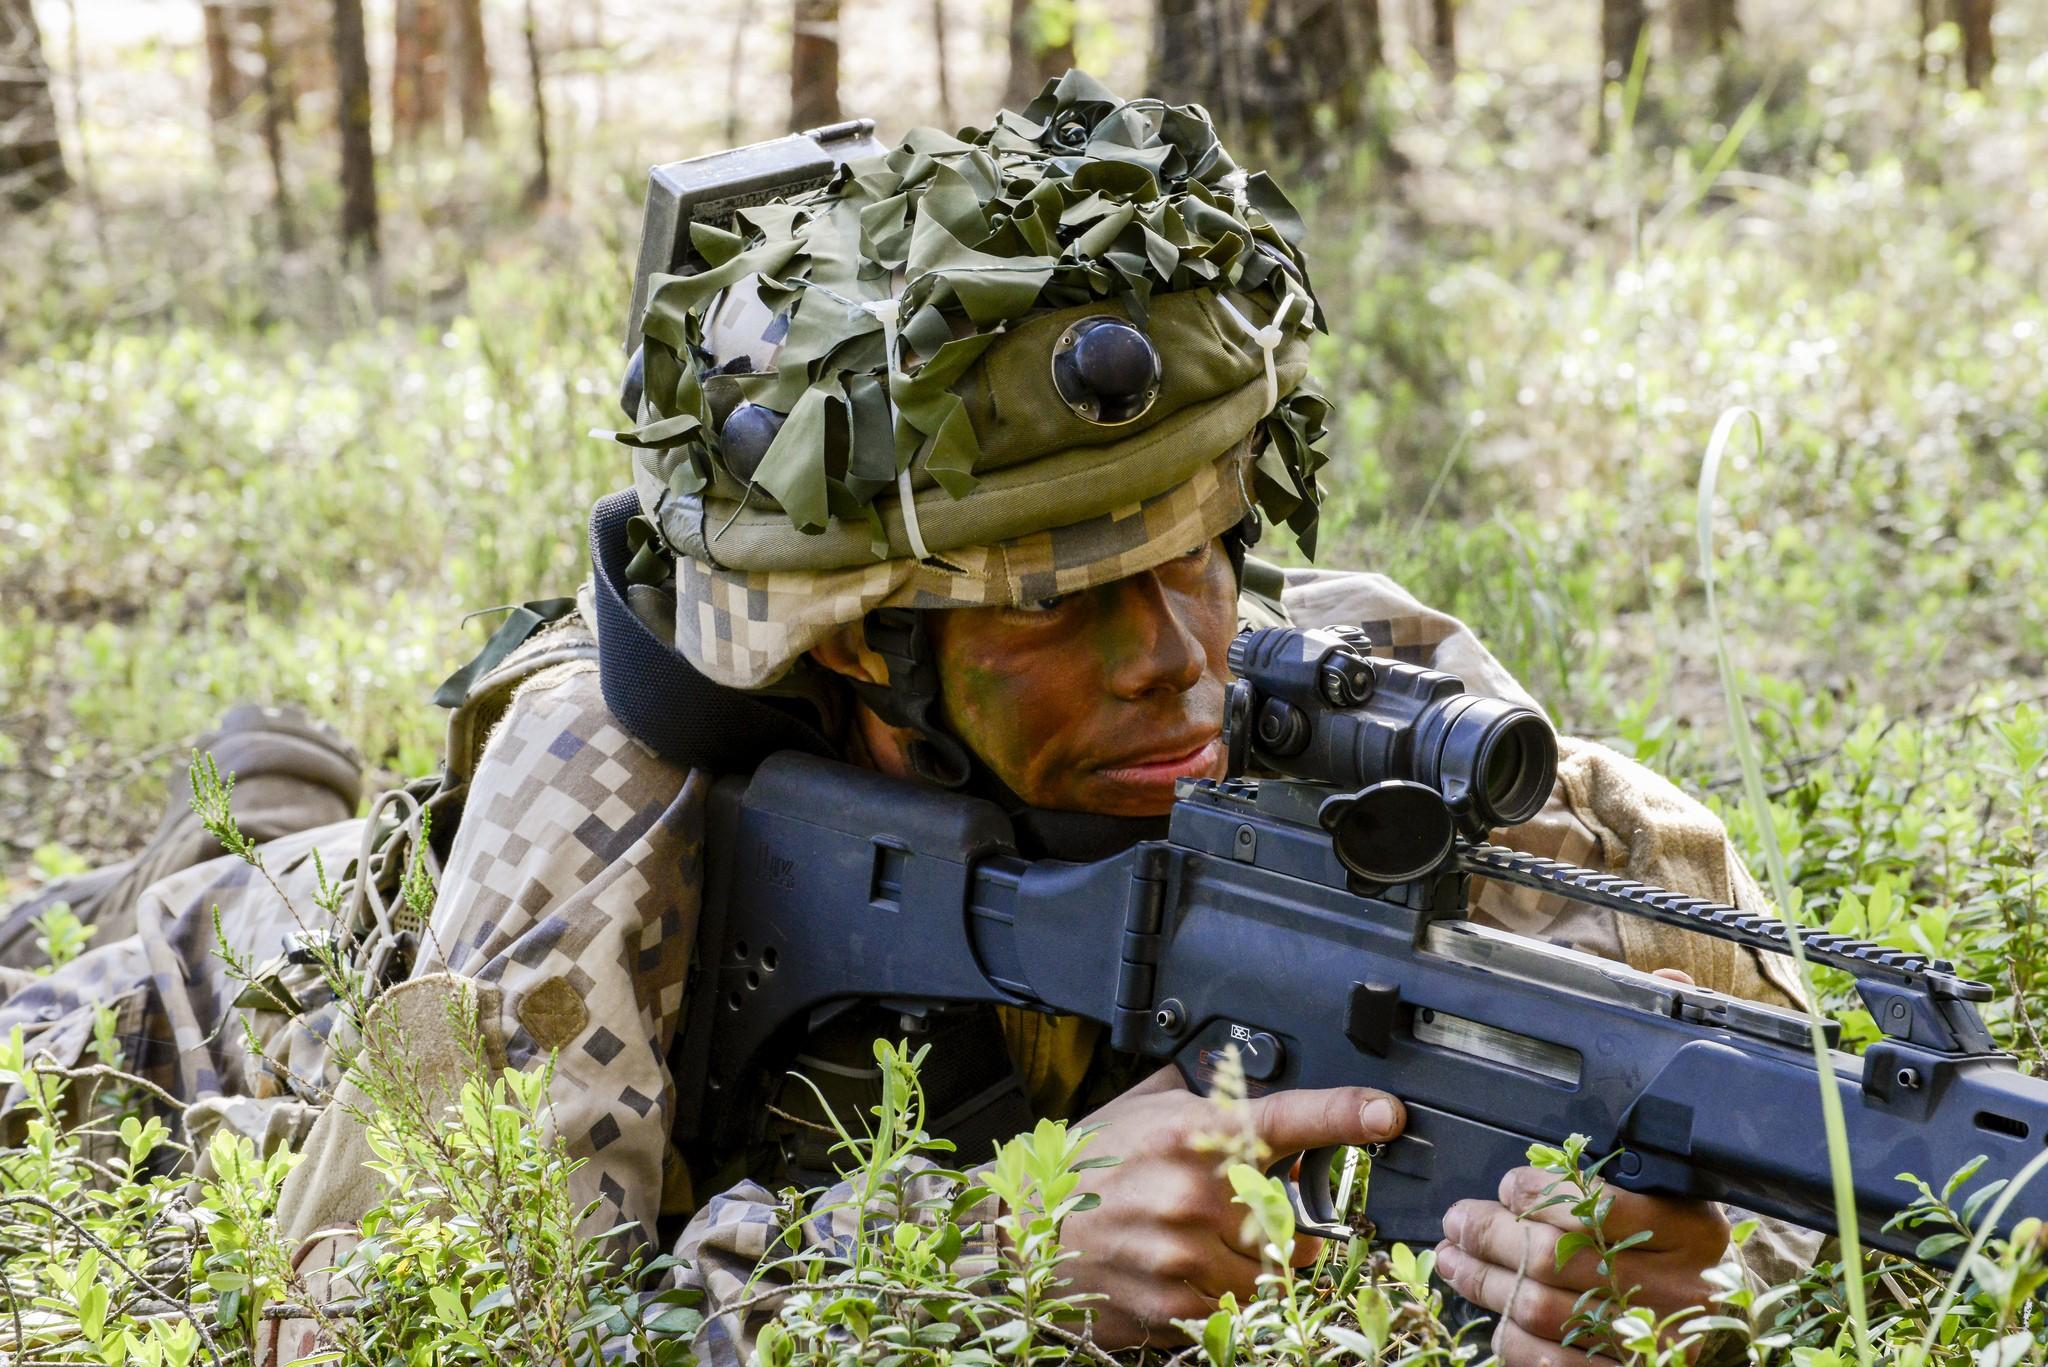 Saber Strike • United States Army Europe • International Exercise focusing on the Baltic States